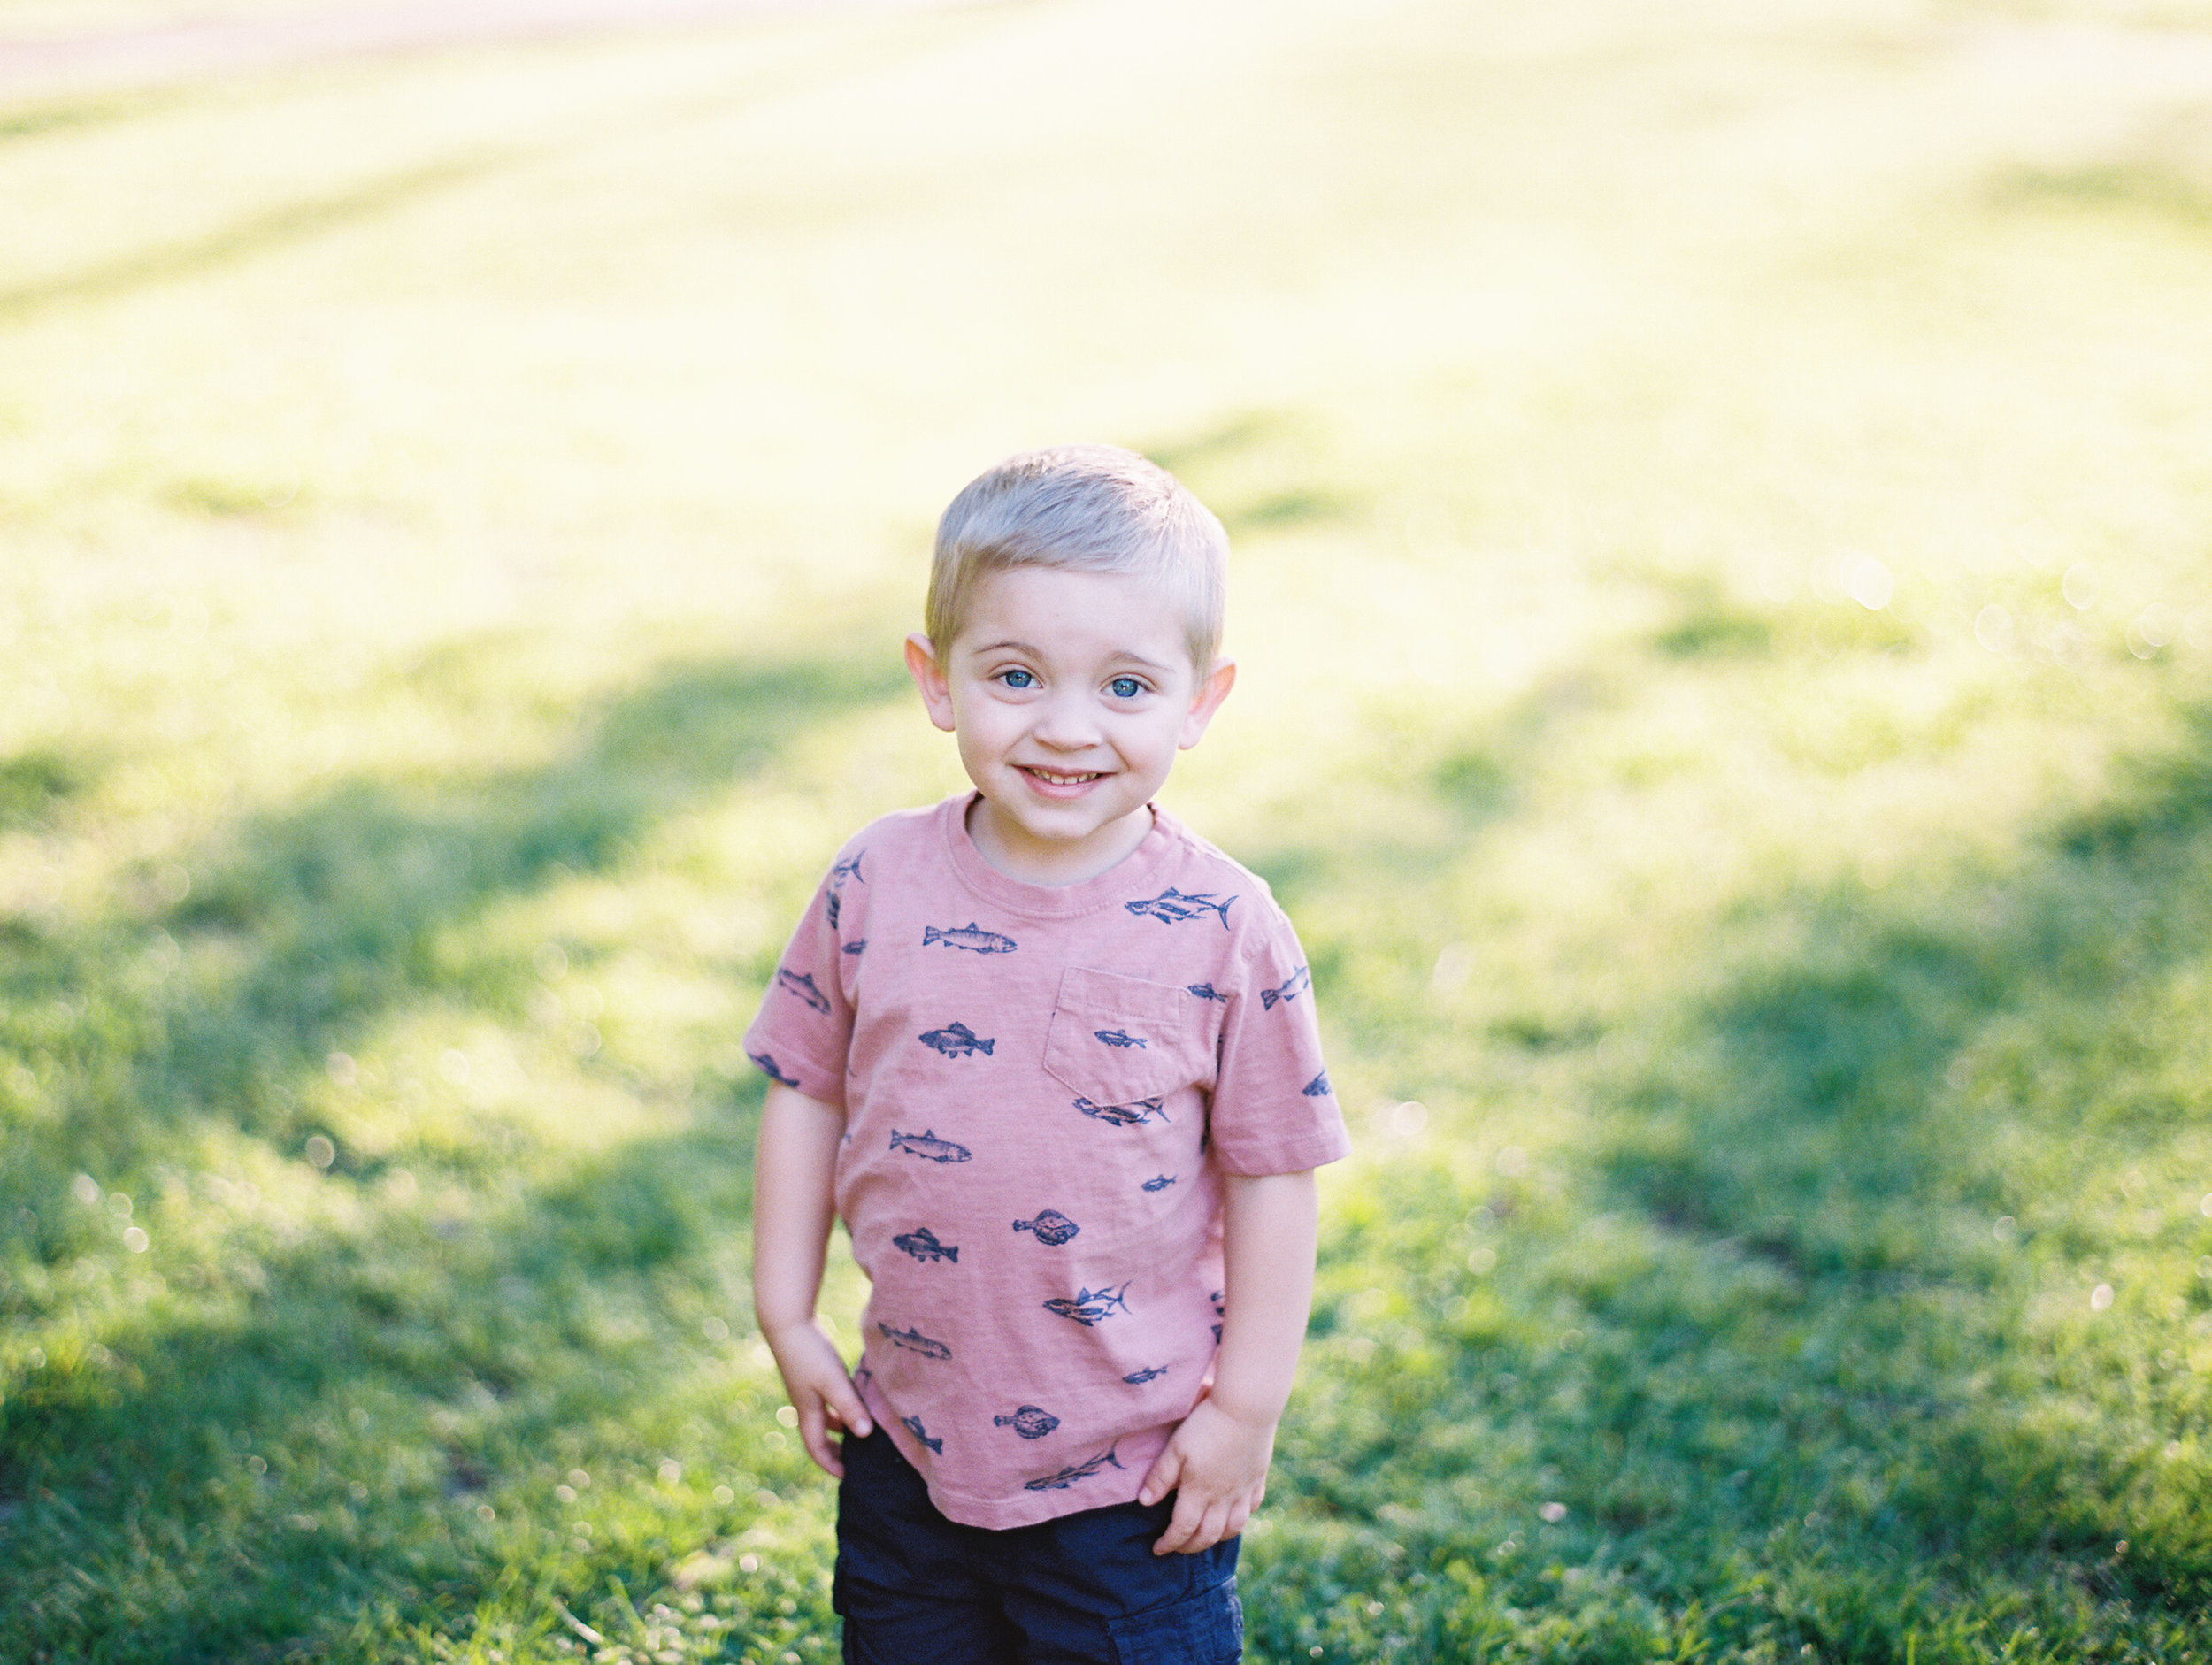 rachelsimaphotographyfamilyportrait-bradden-004.jpg